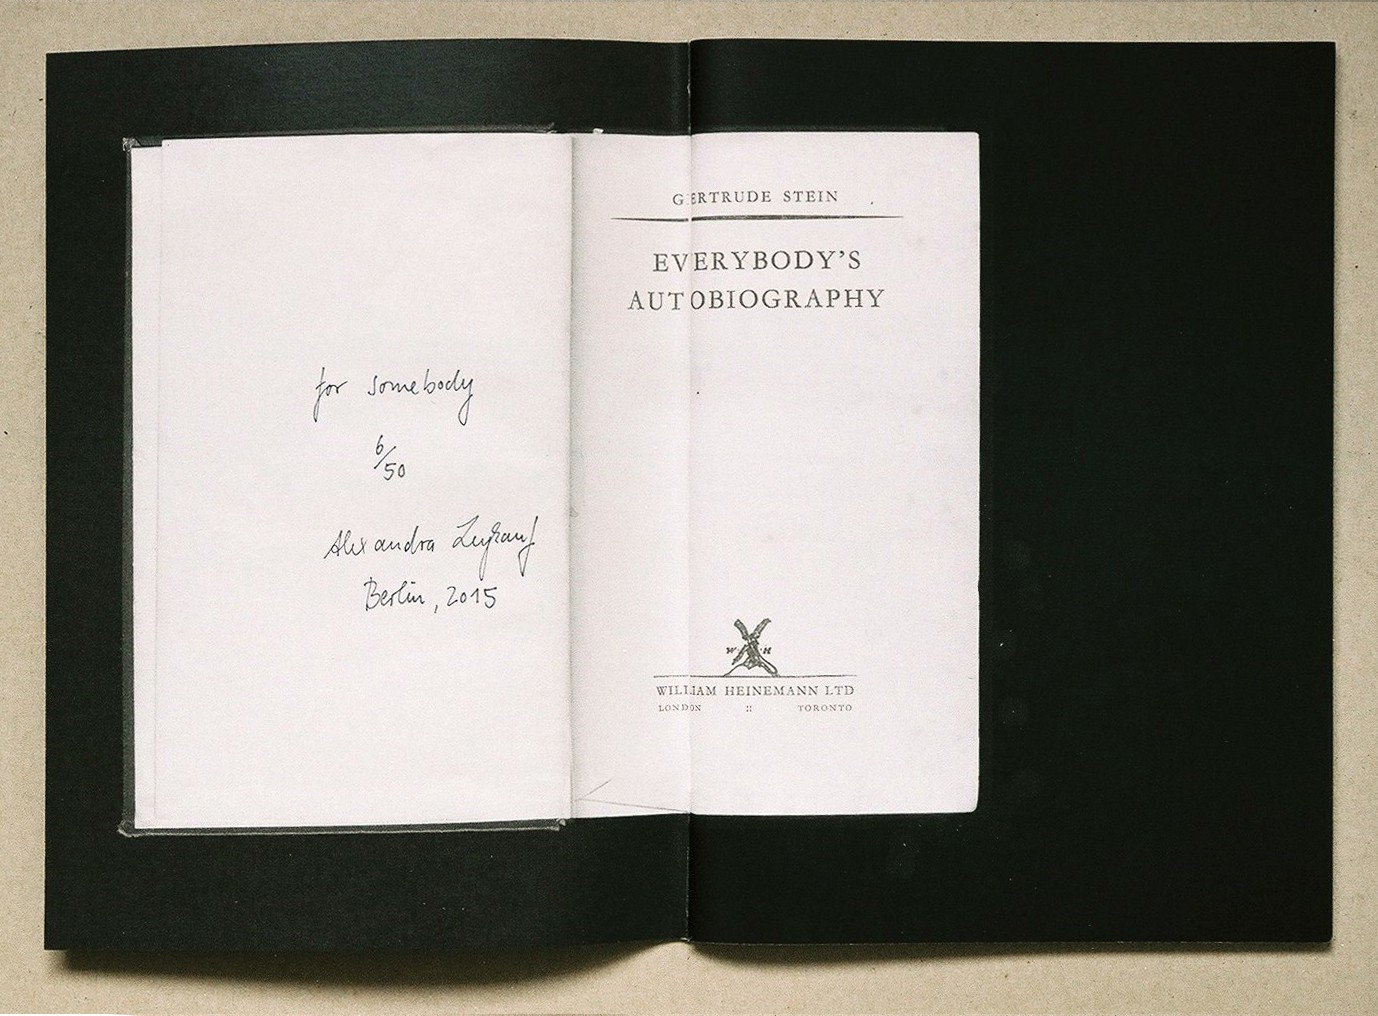 Everybody's Autobiography, Alexandra Leykauf, artist book